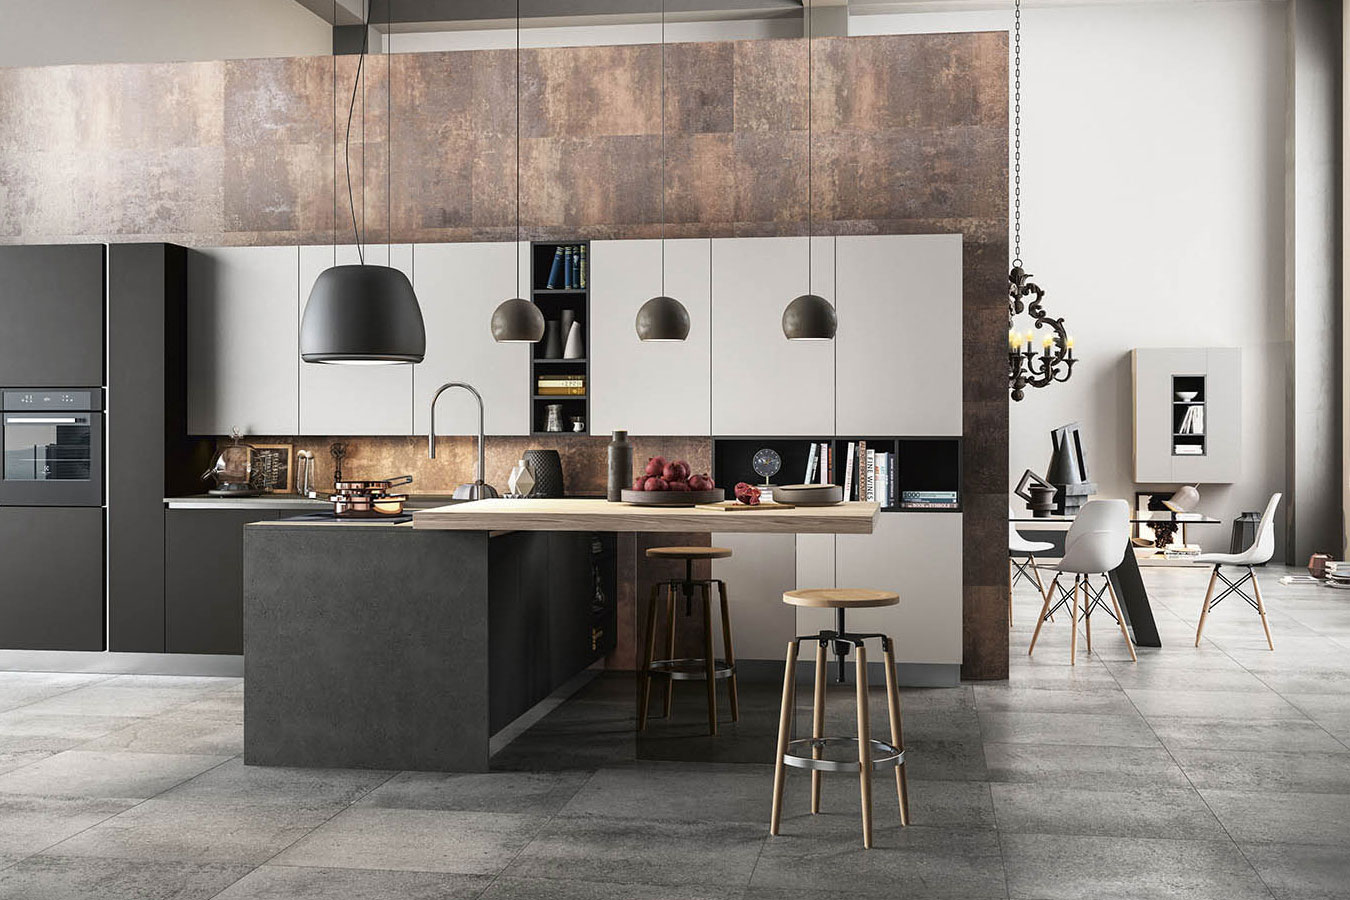 Cucina Time di Arredo3 da righetti mobili a Novara Piemonte